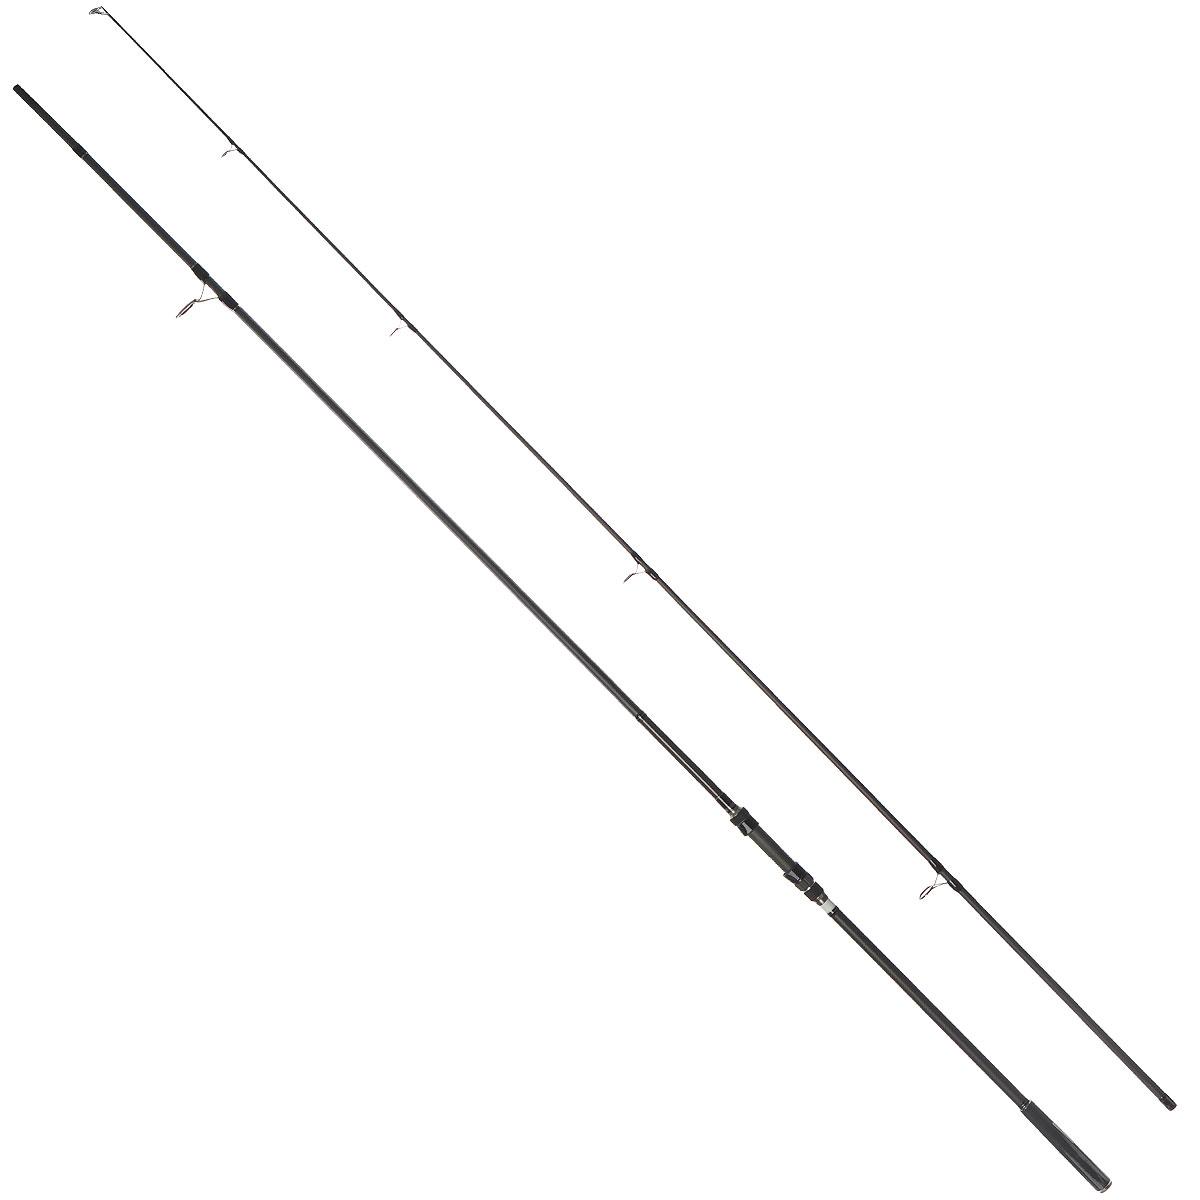 Удилище карповое Daiwa Windcast Carp, 3,9 м, 3,5 lbs mikado sakana hanta carp 390 3 00 lbs 3 секц